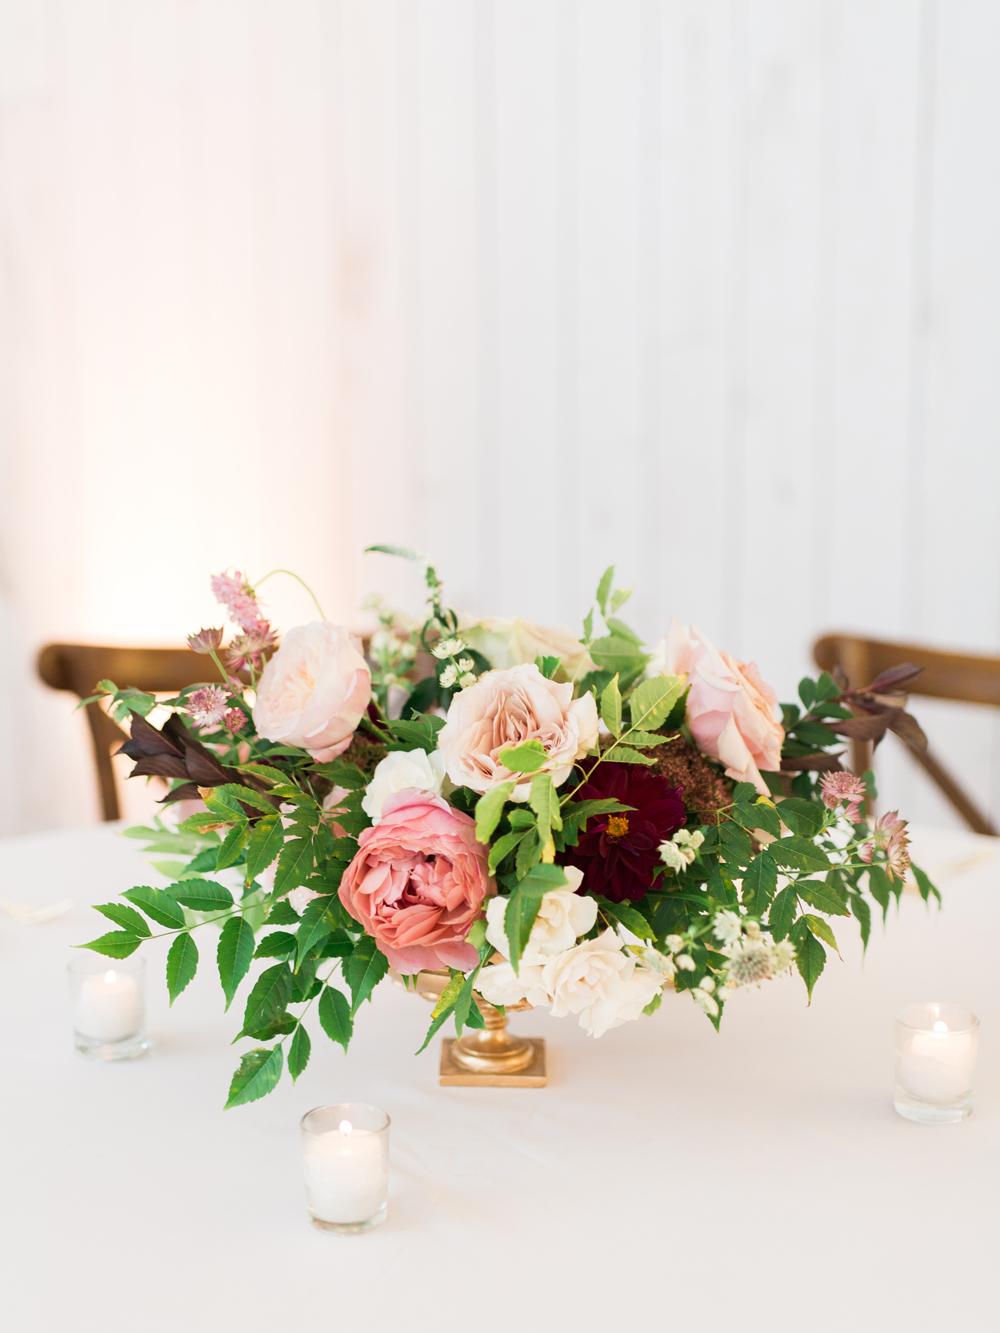 floral centerpieces - photo by Elisabeth Carol Photography http://ruffledblog.com/picturesque-garden-wedding-at-white-sparrow-barn